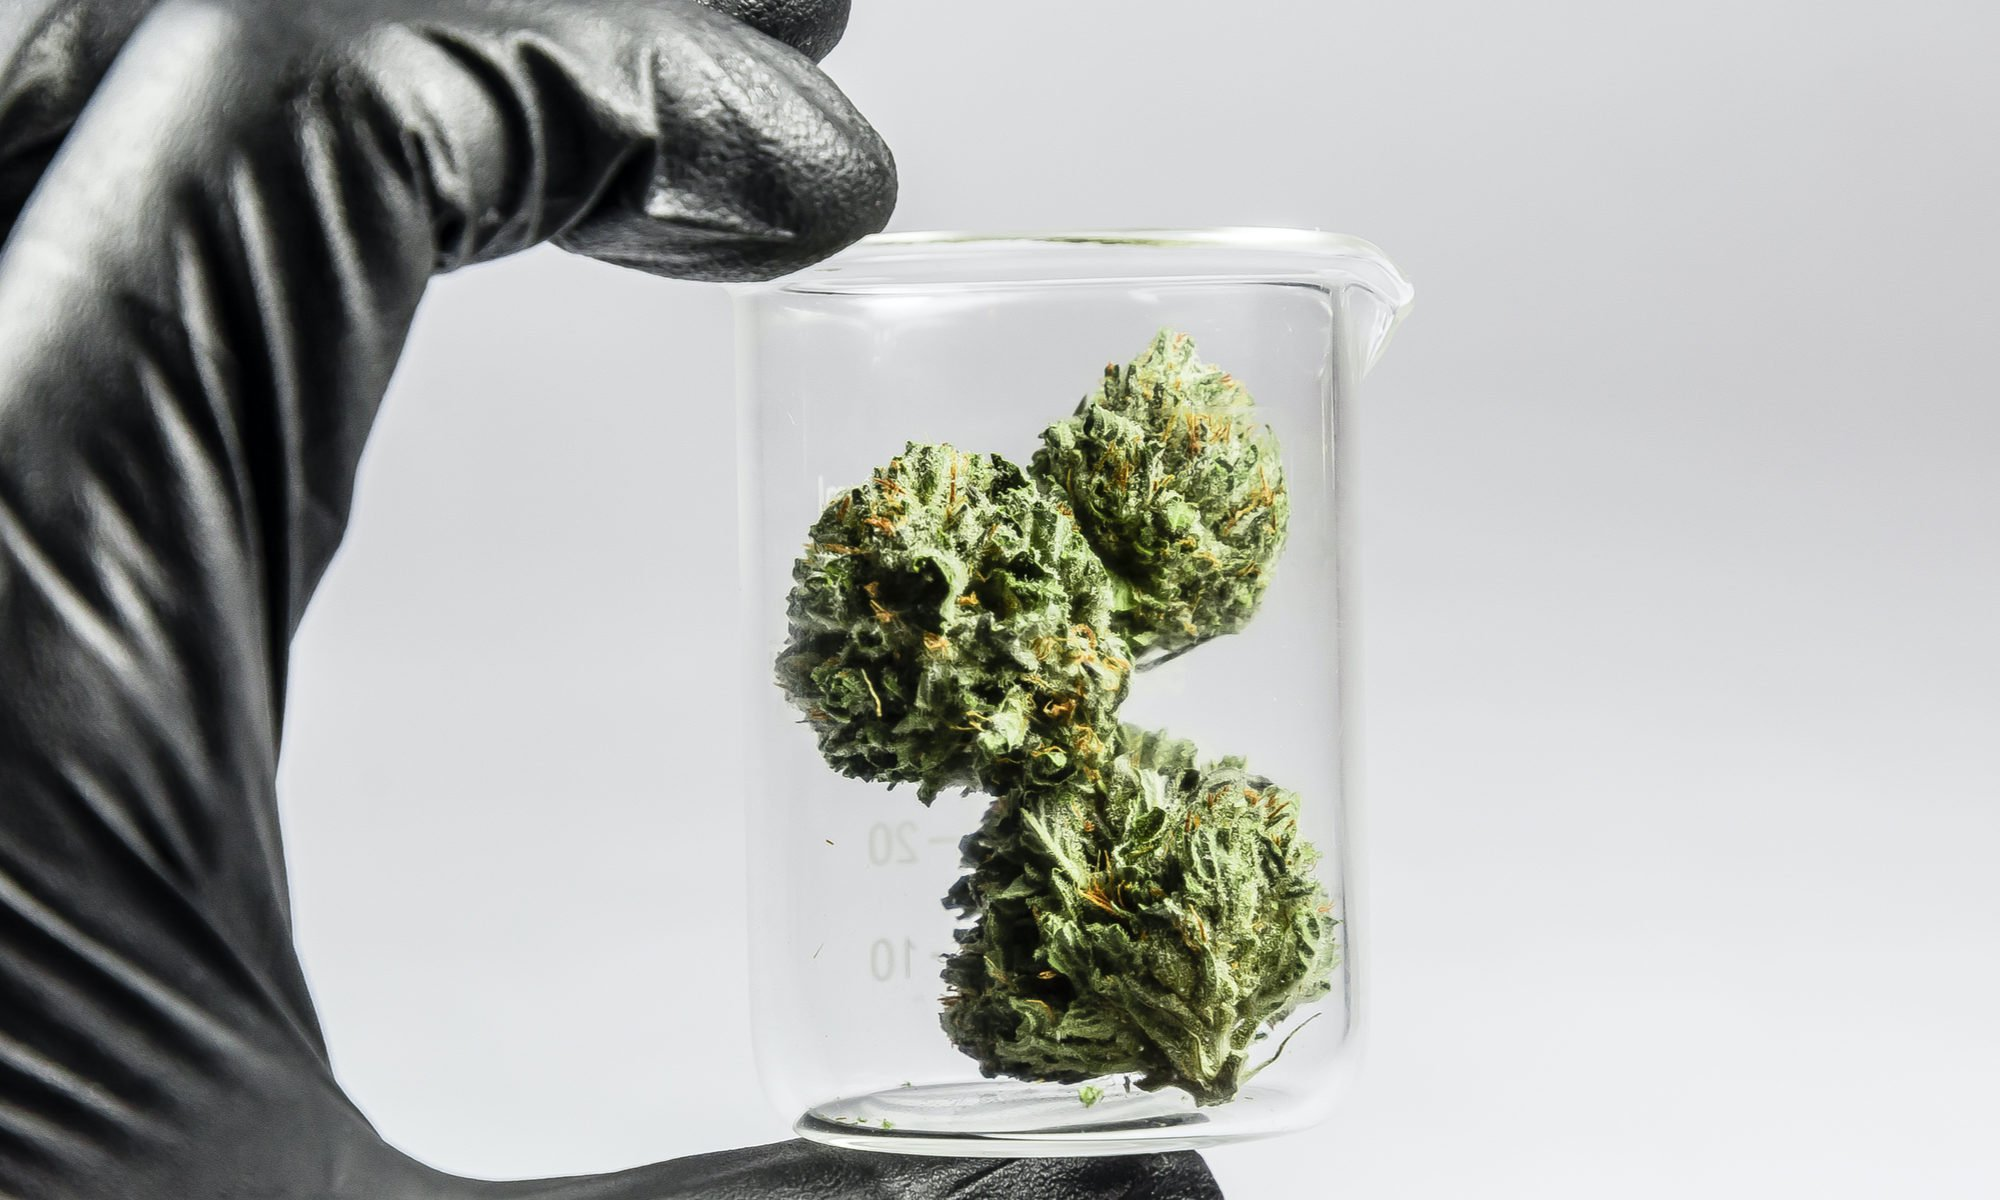 quality cannabis